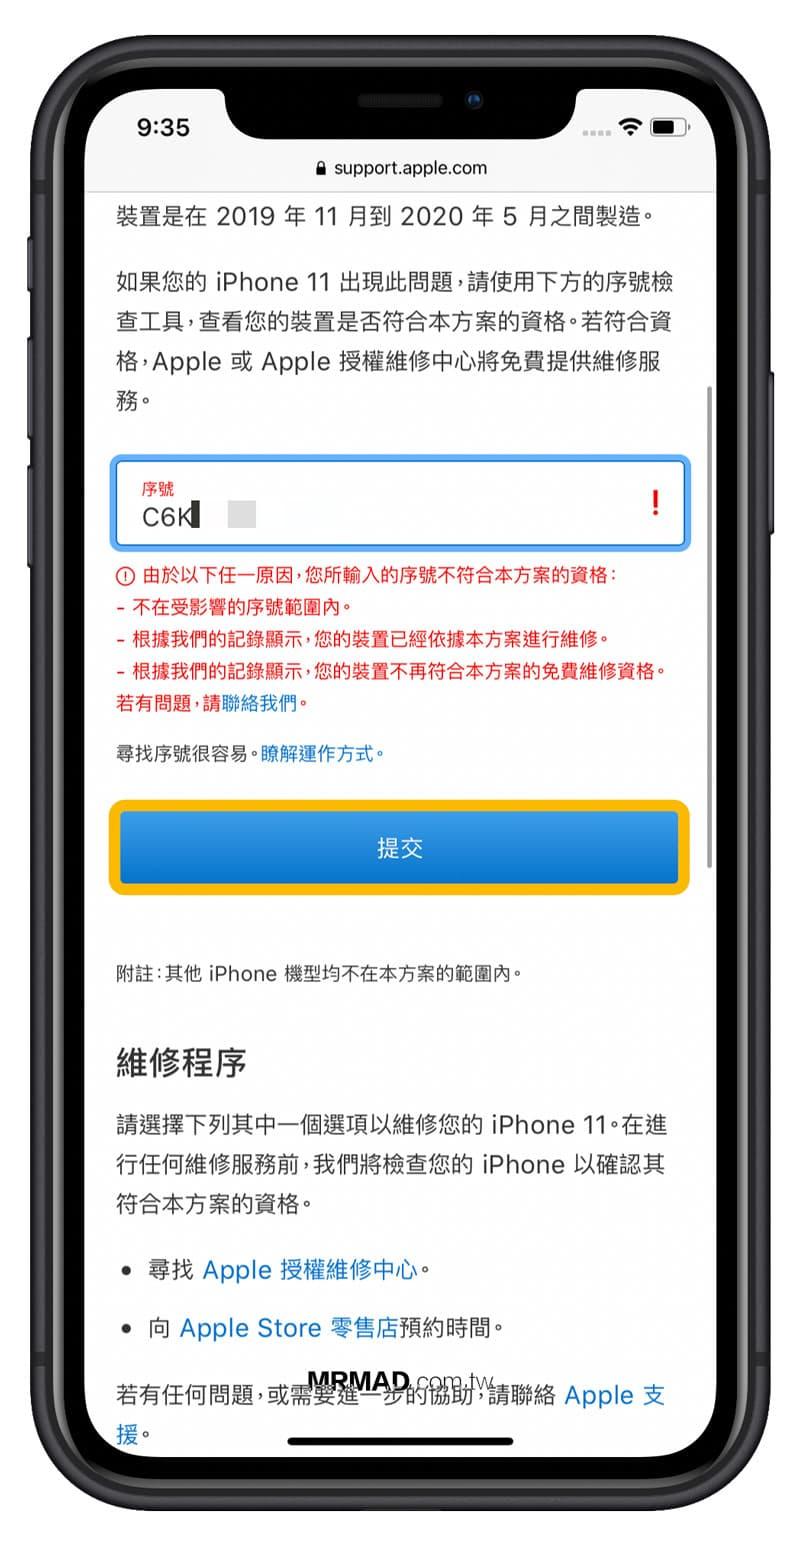 iPhone 11 觸控不靈敏問題與查詢方法1